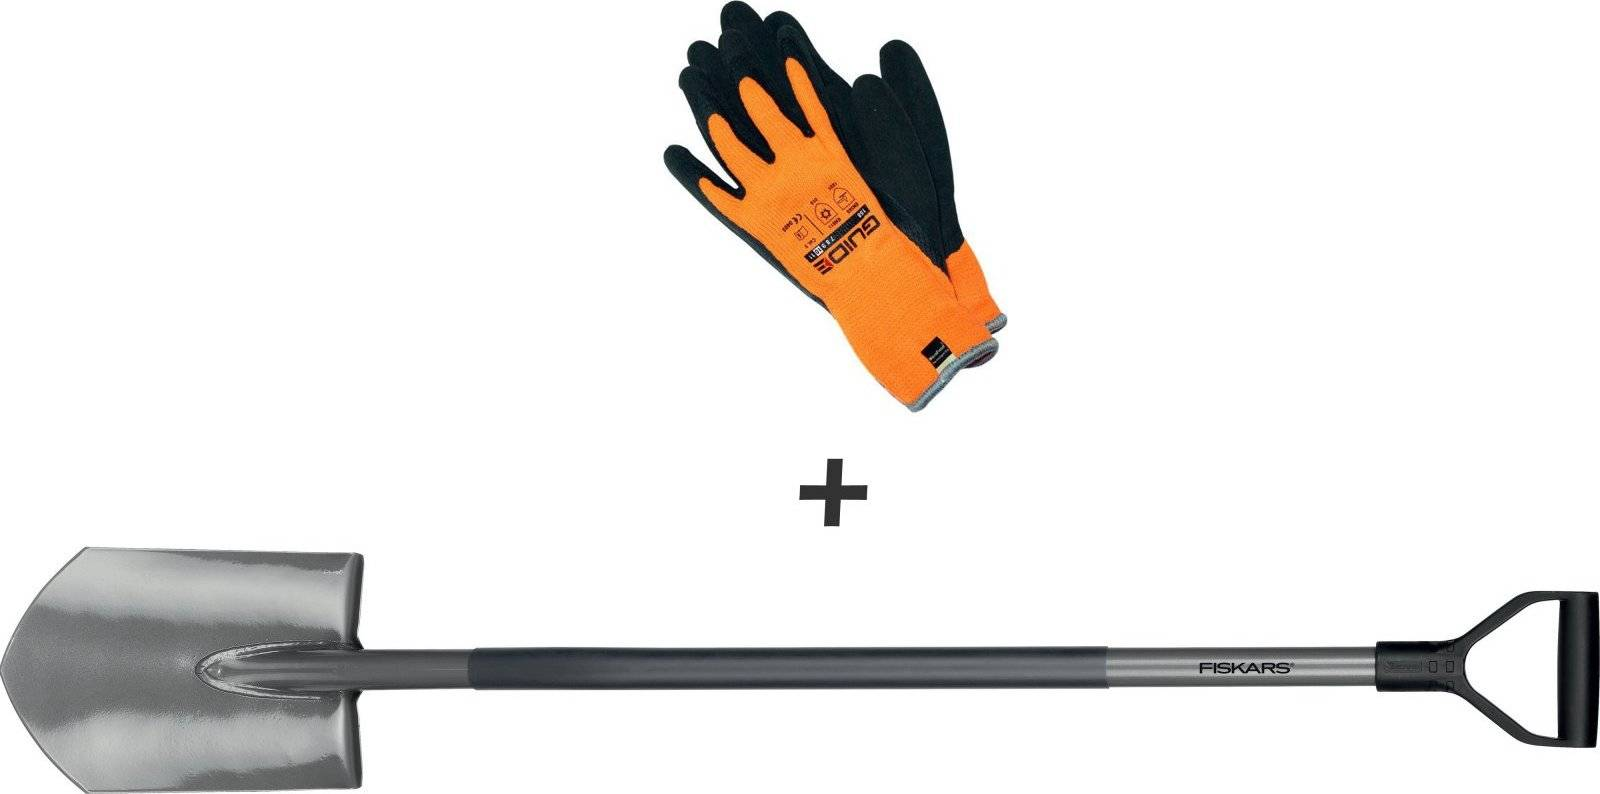 Sada ryč špičatý + pracovní rukavice 1003460 Fiskars